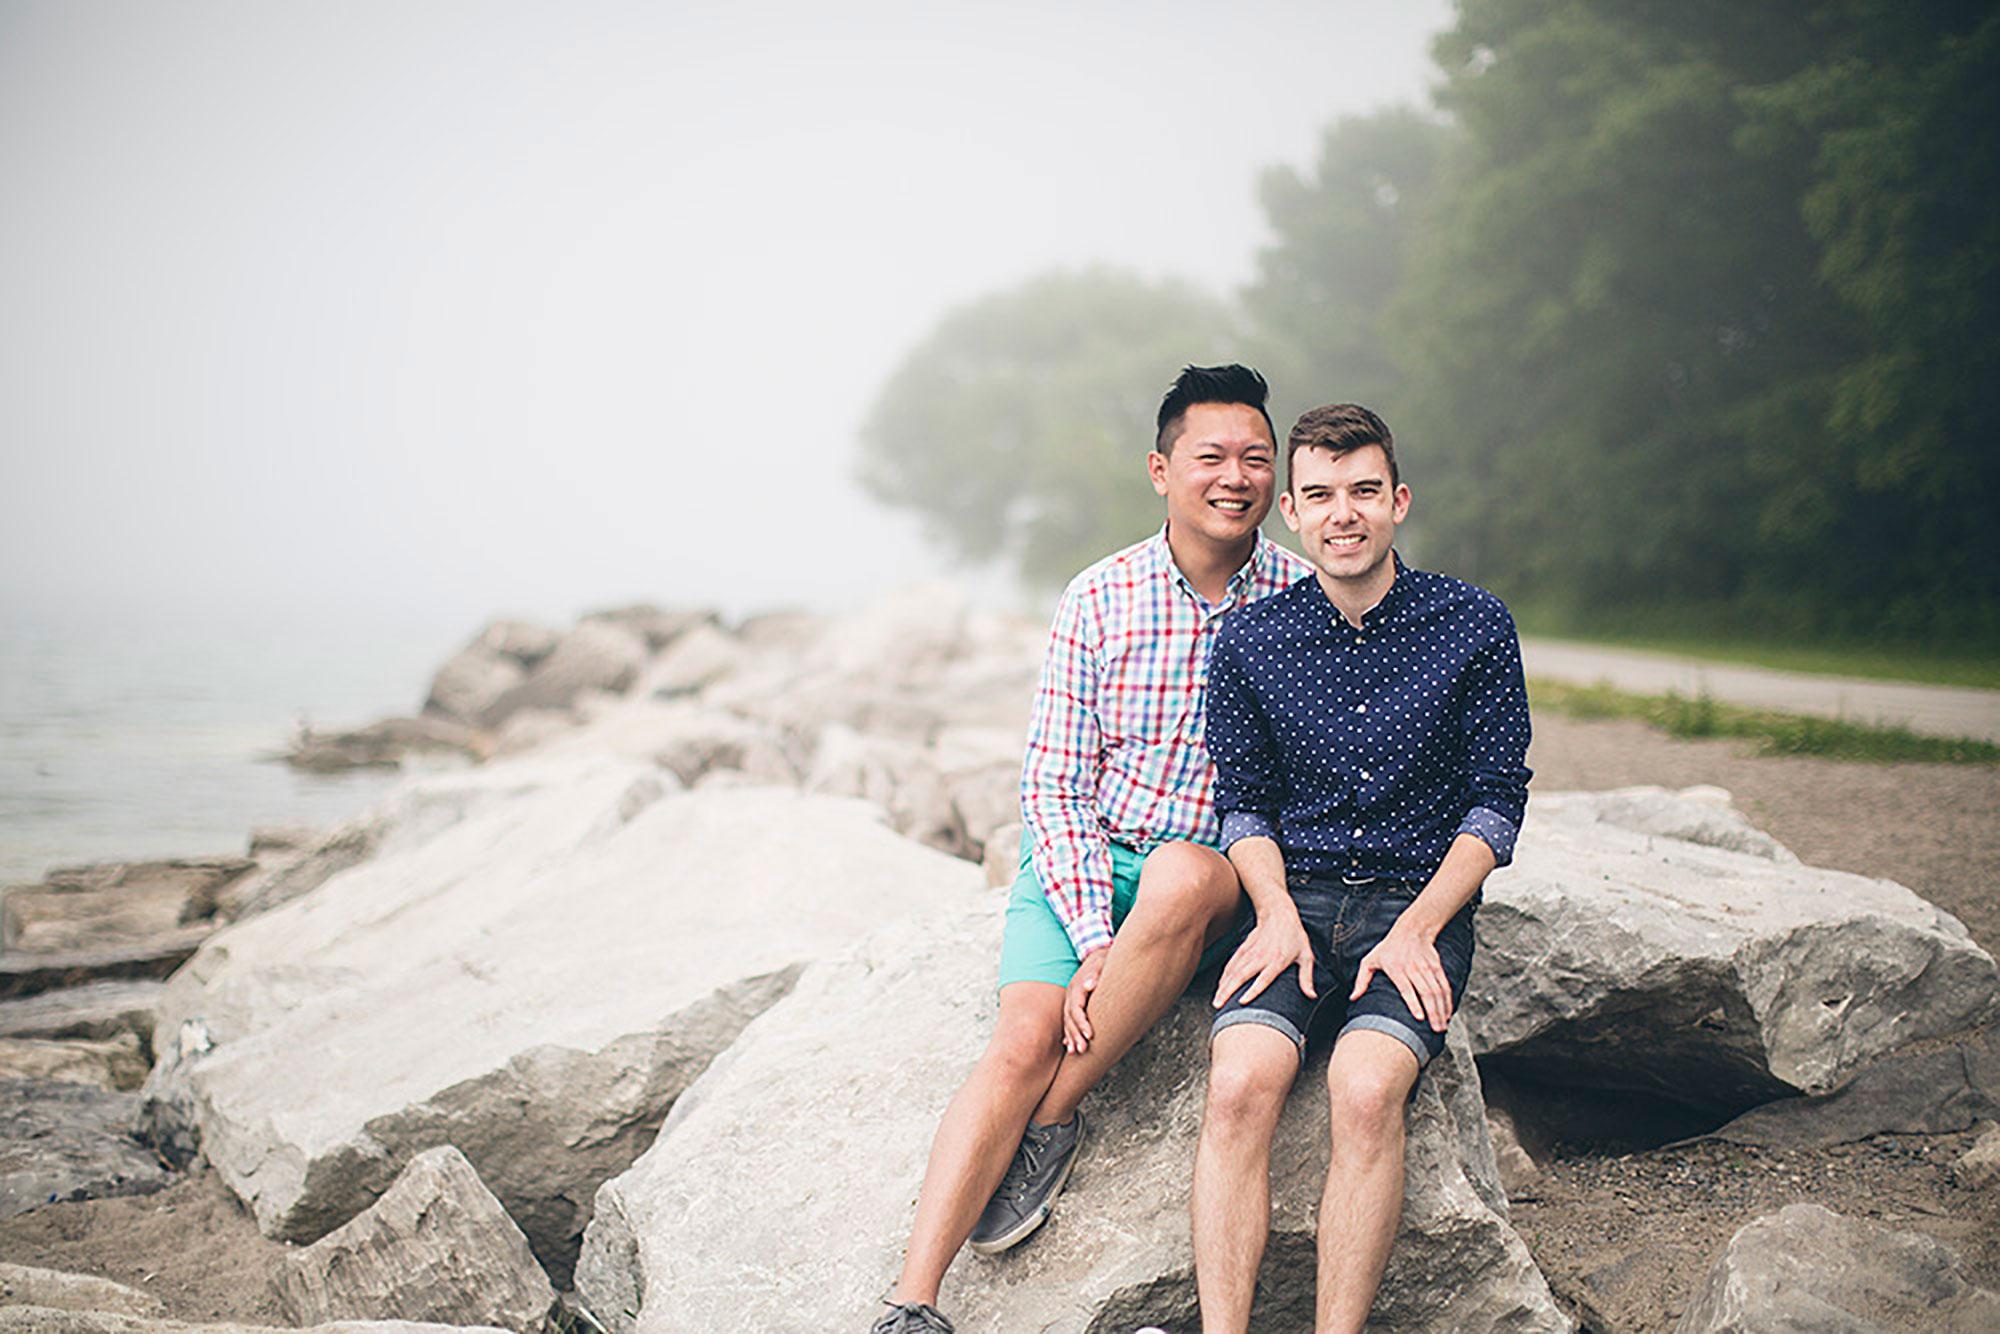 Jordan-Beach-Engagement-Vineyard-Bride-Photo-By-Foxglove-Photography-015.jpg